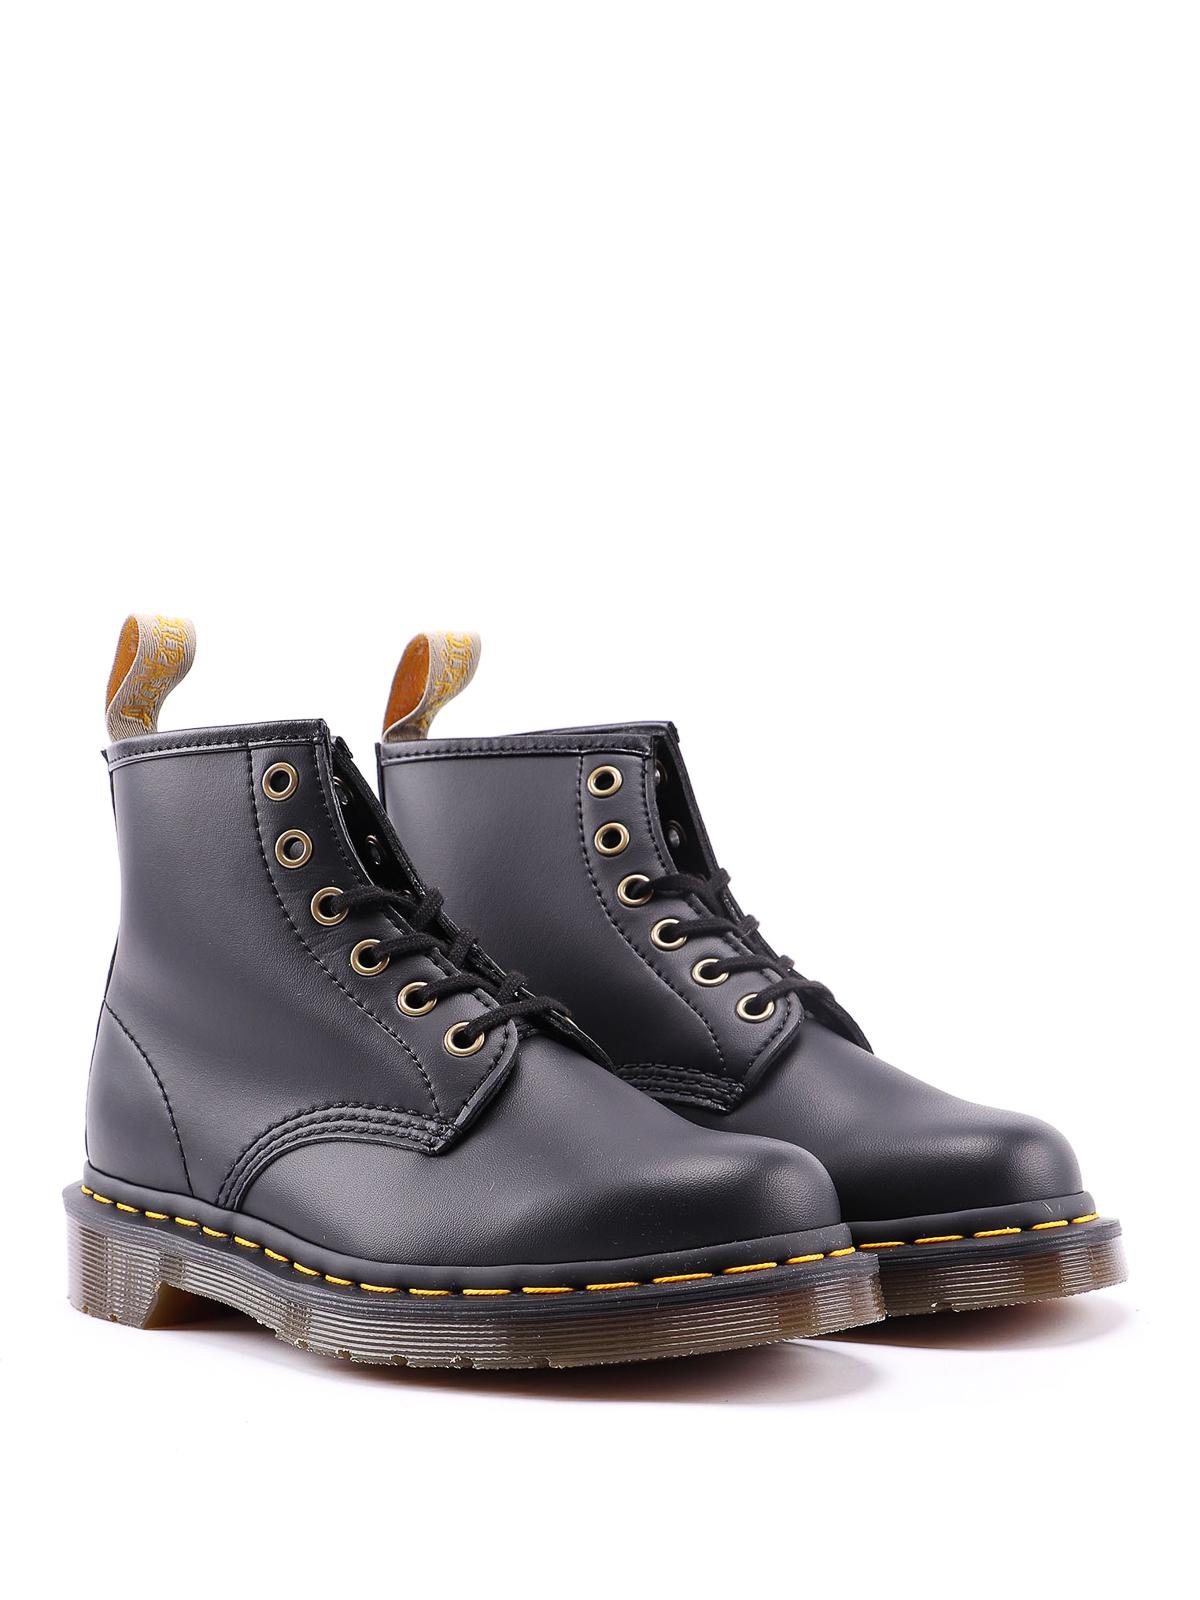 Dr. Martens - Vegan 101 ankle boots